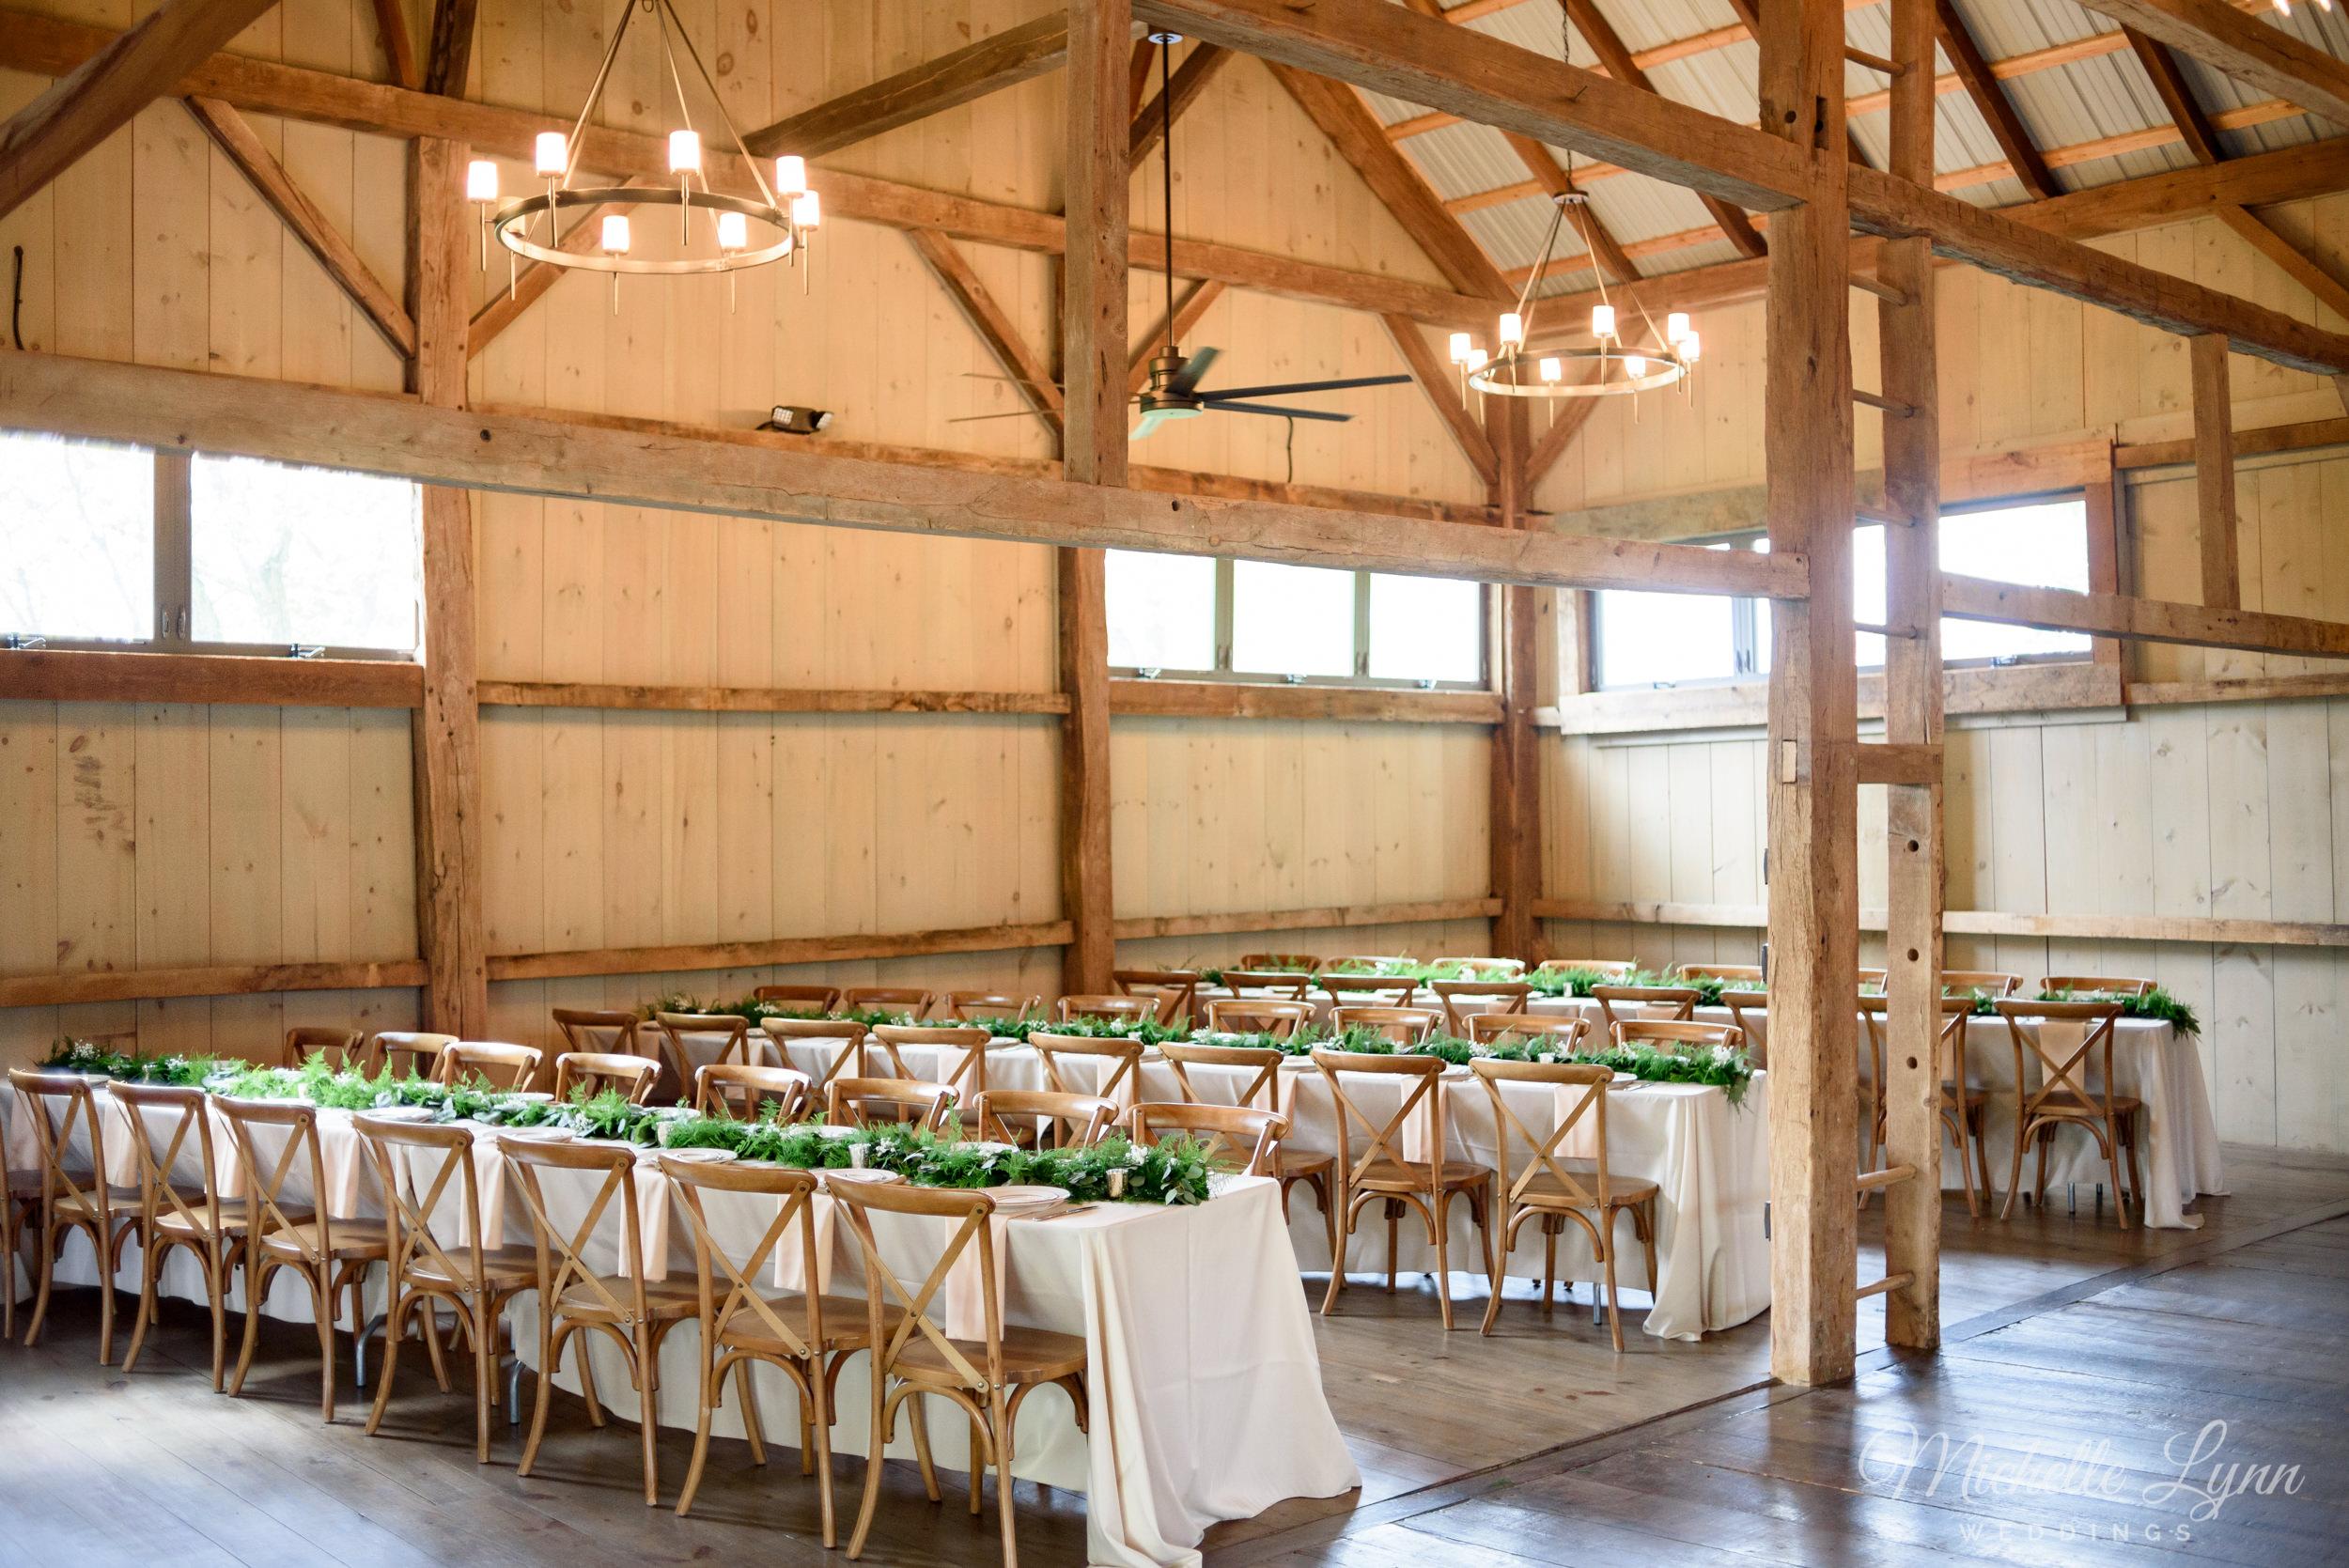 mlw-the-farm-bakery-and-events-wedding-photos-60.jpg